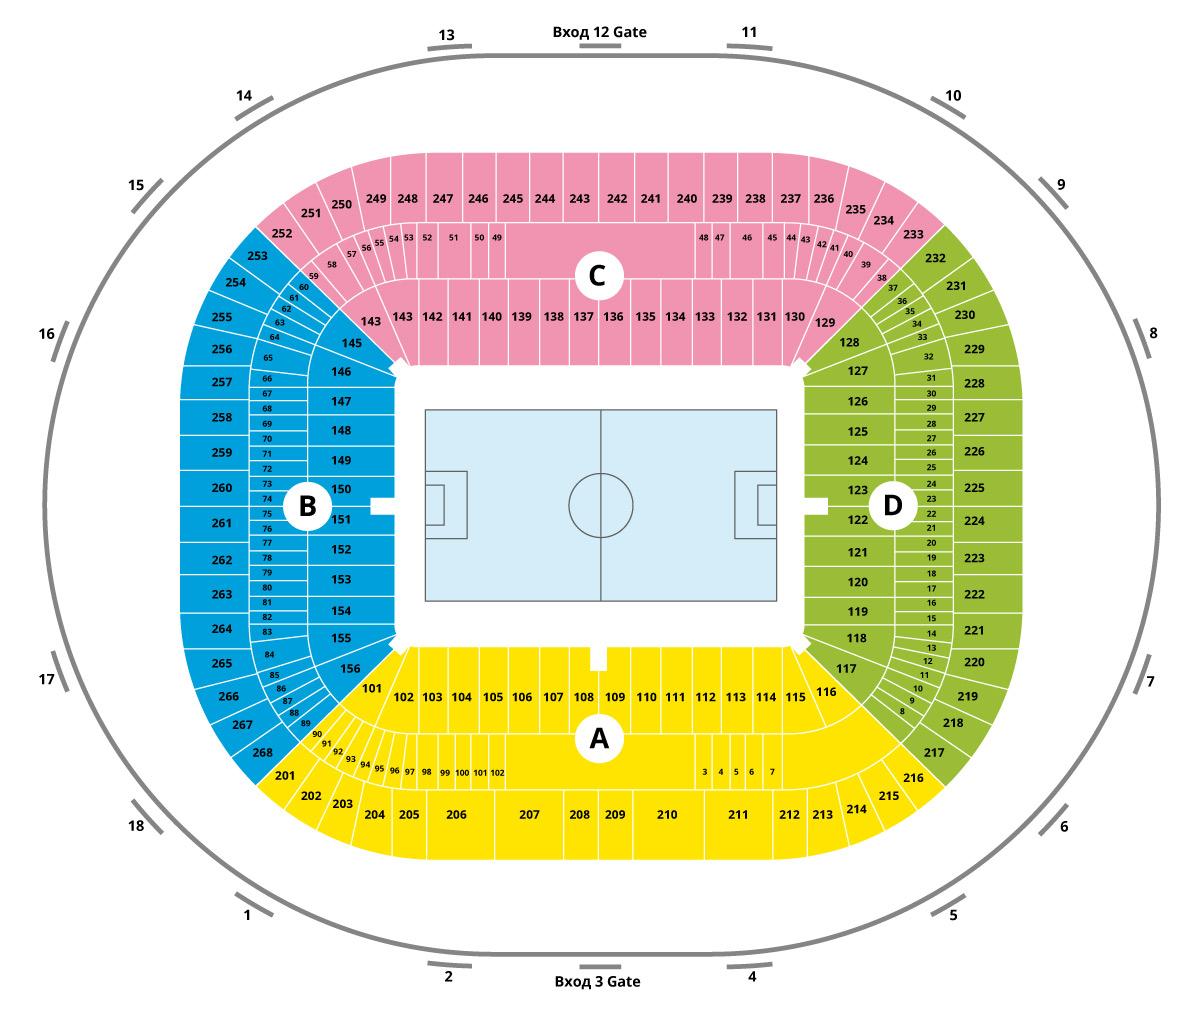 ФК Динамо Москва - Стадион Арена